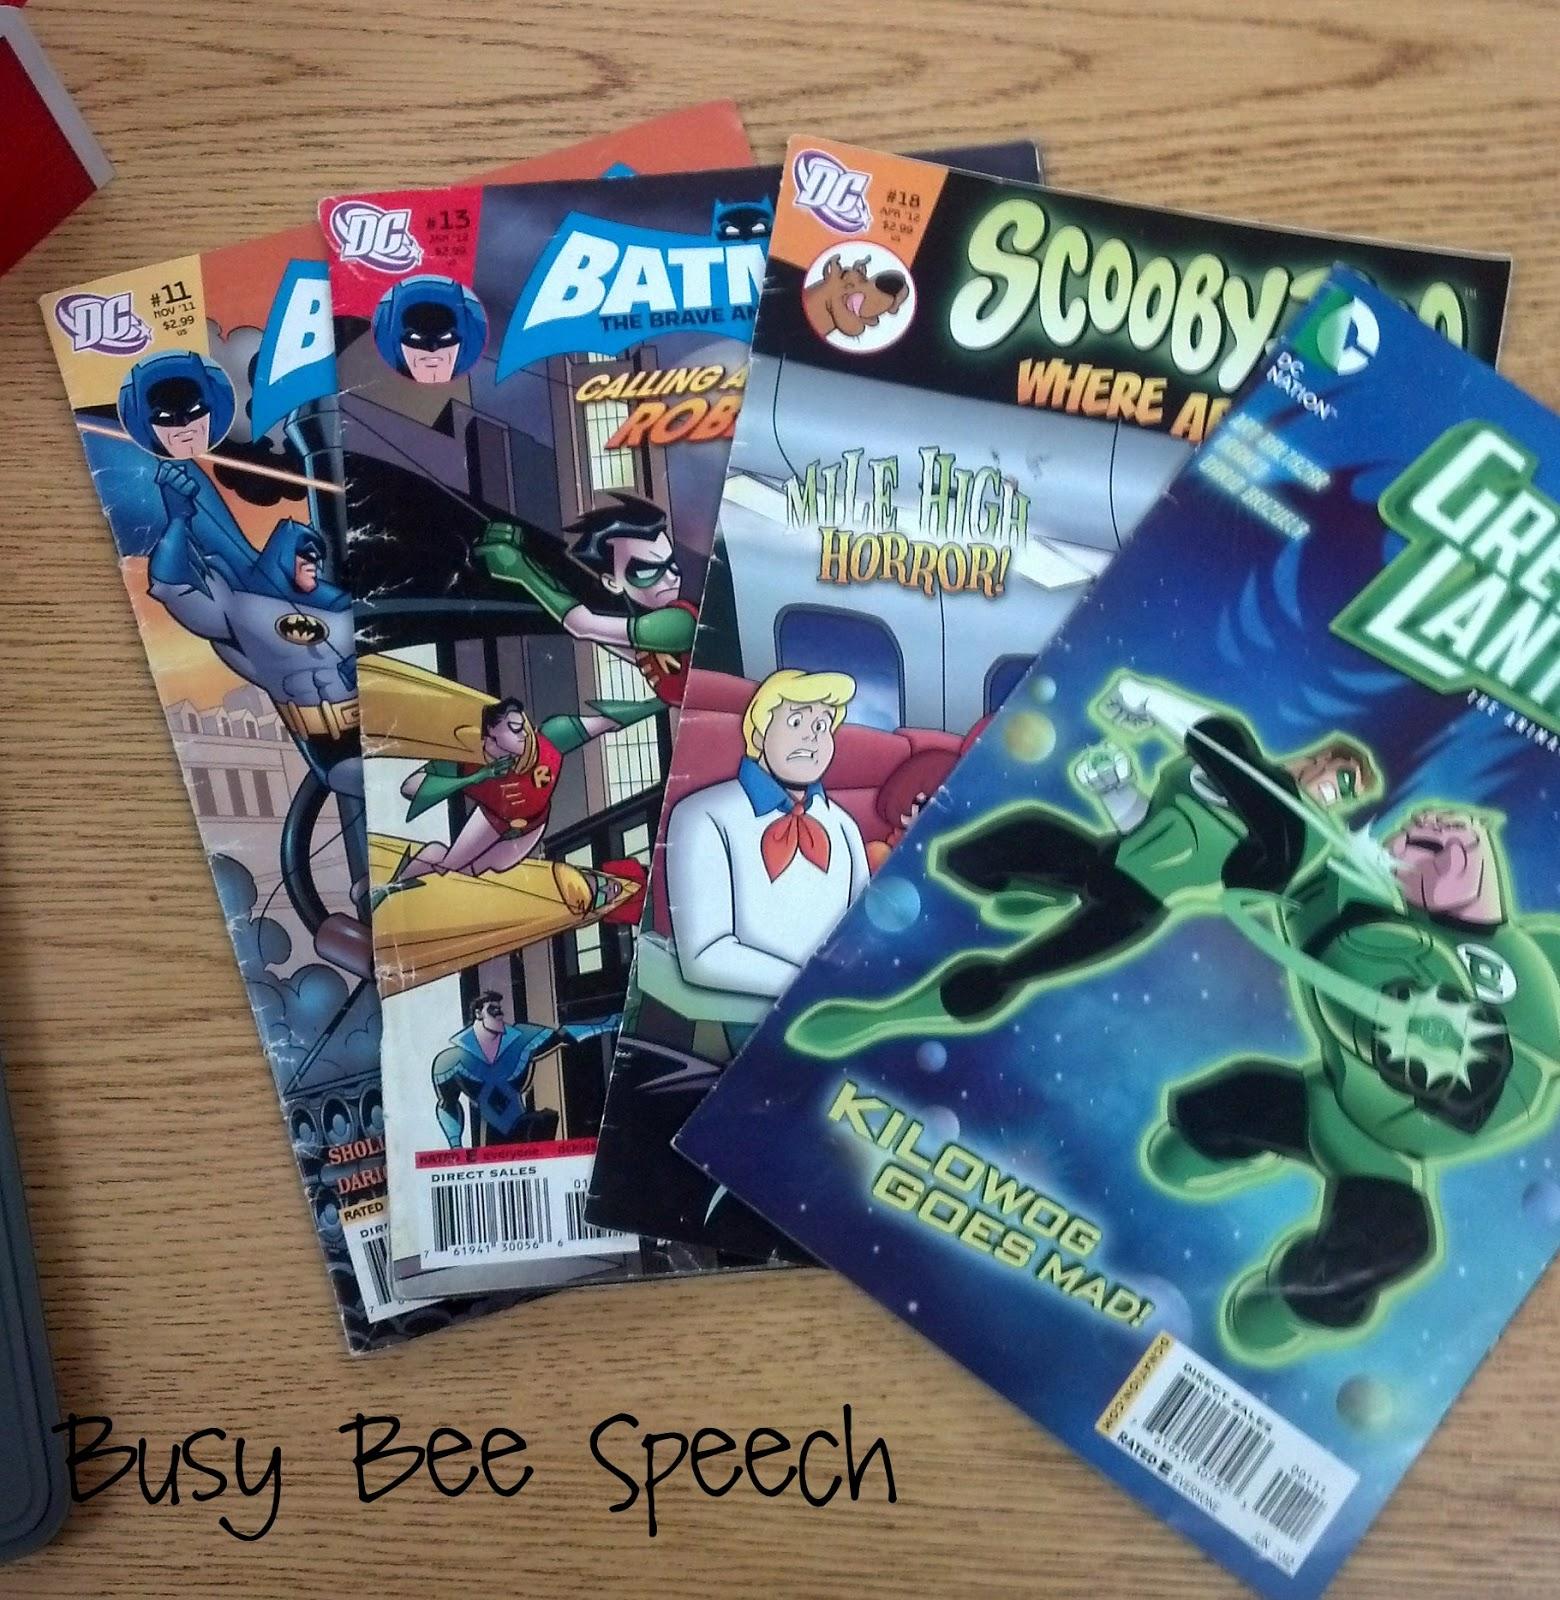 Busy Bee Speech Superhero Comic Book Companion Pack